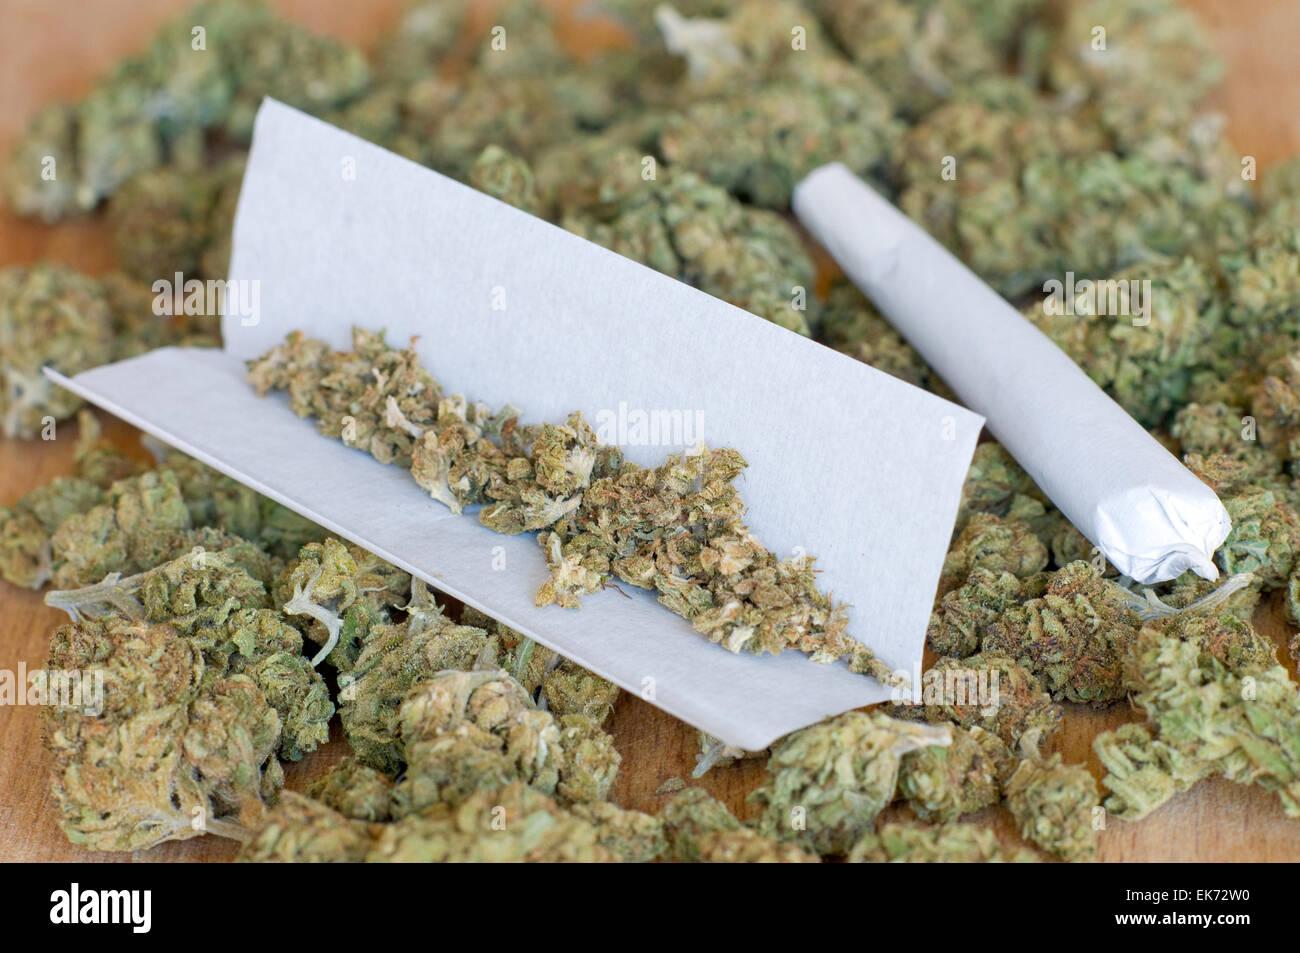 Dry marijuana buds with joint - Stock Image